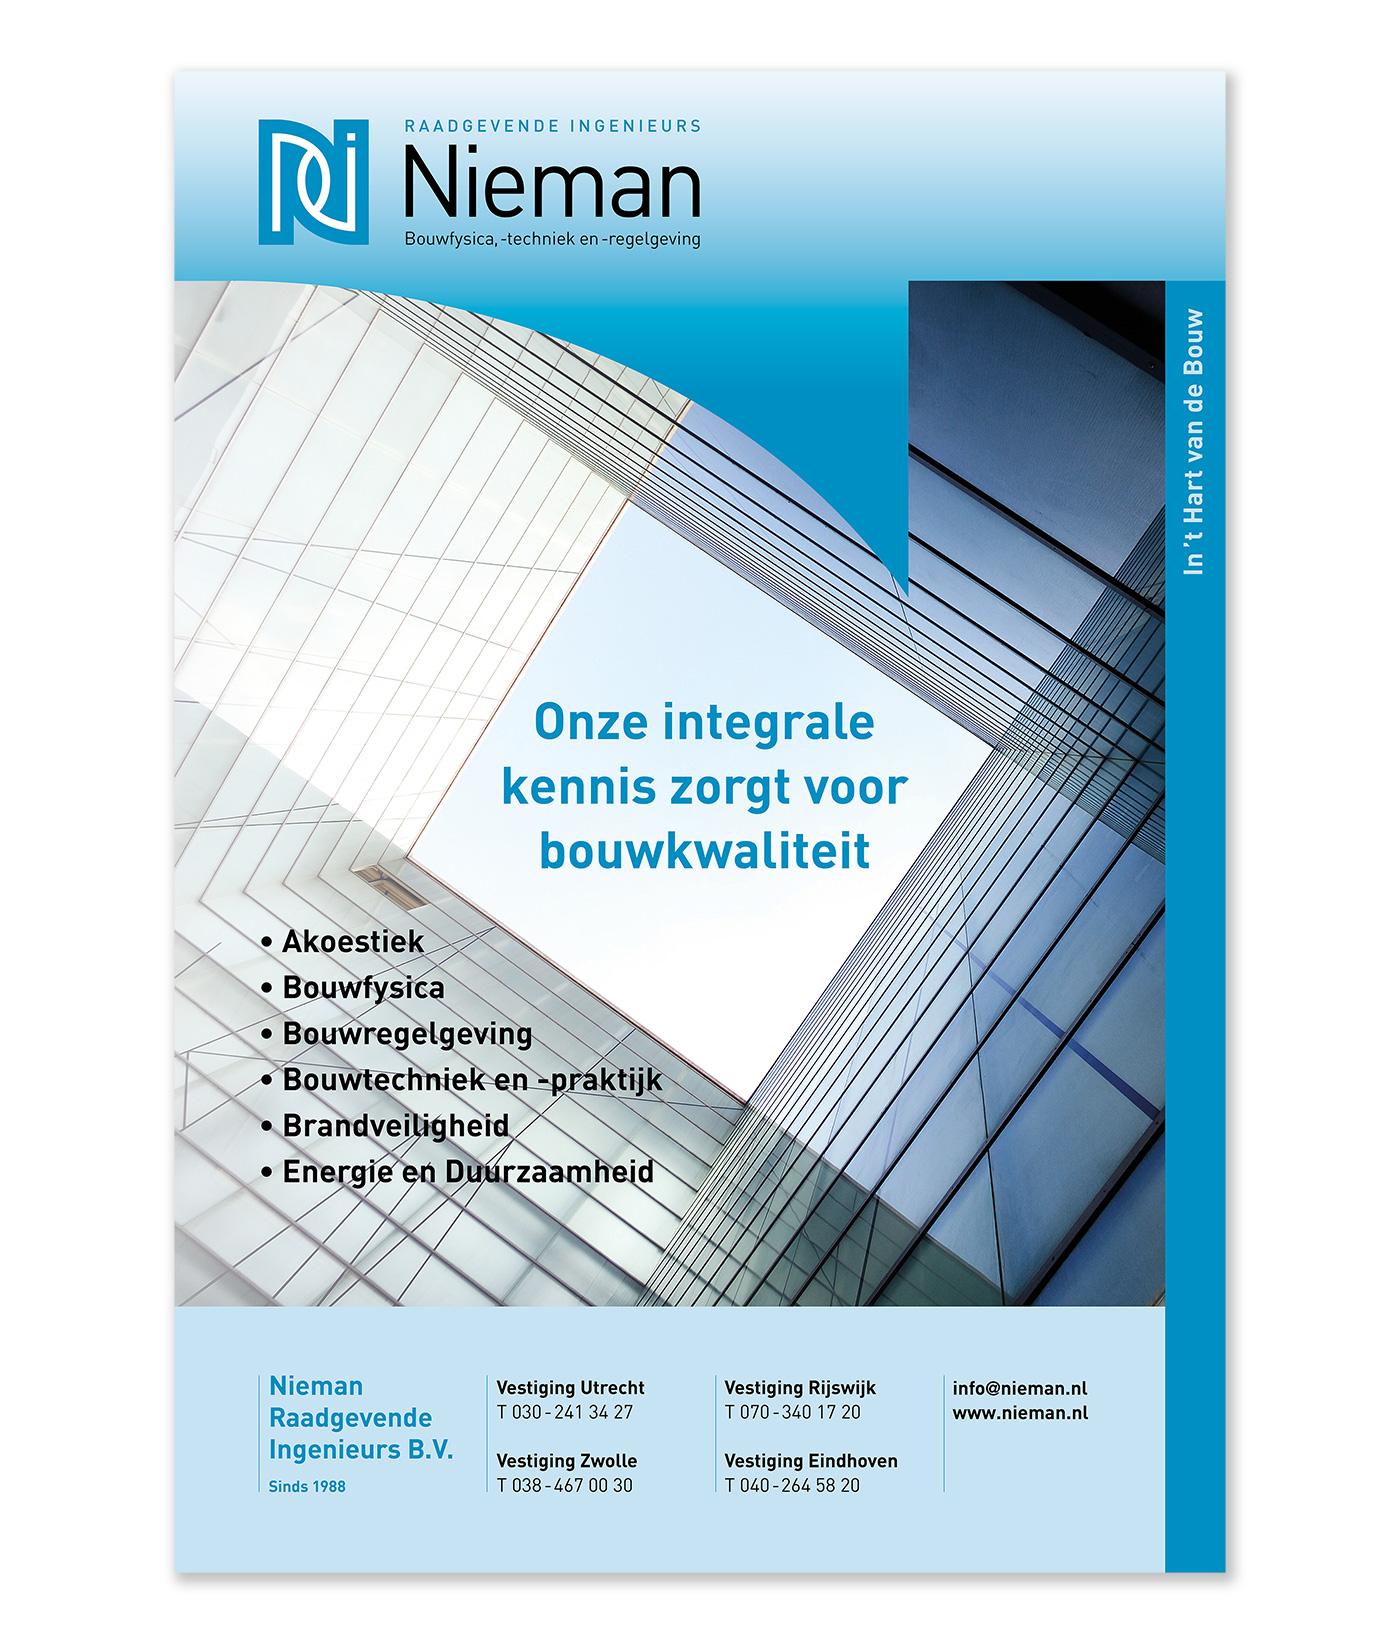 Nieman-Poster-RGI-70x100-1